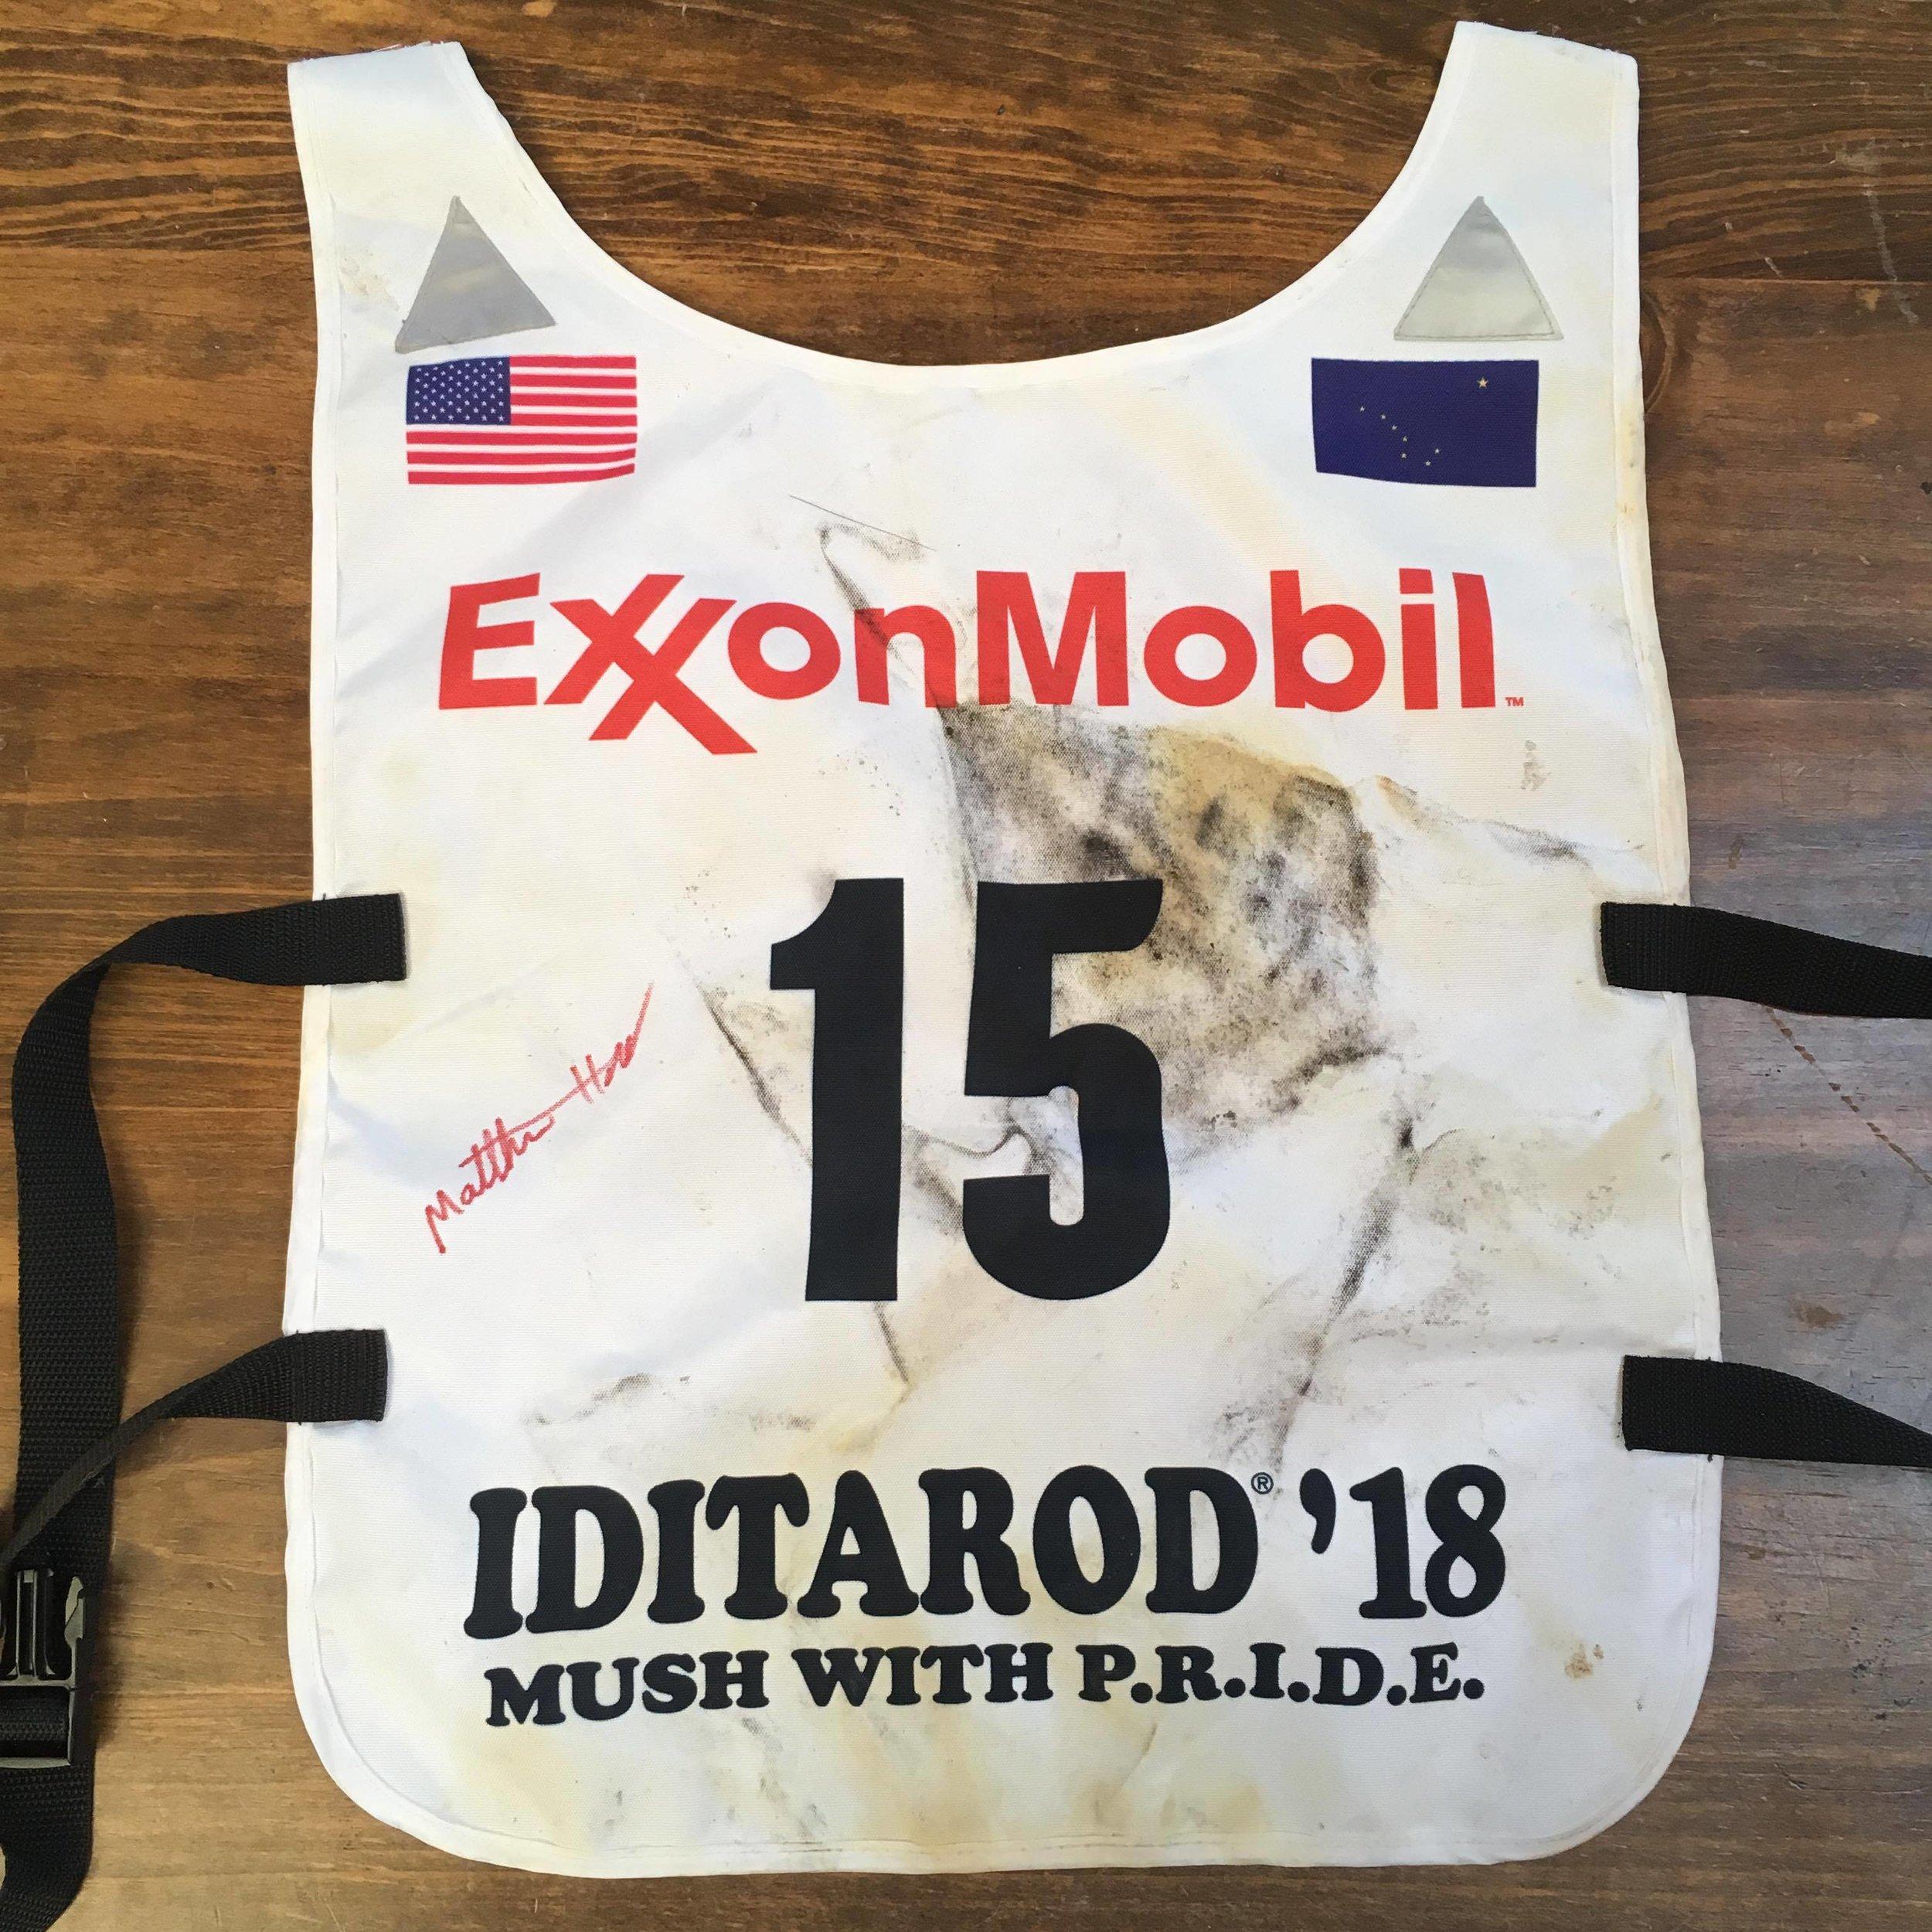 2018 Iditarod Bib #15